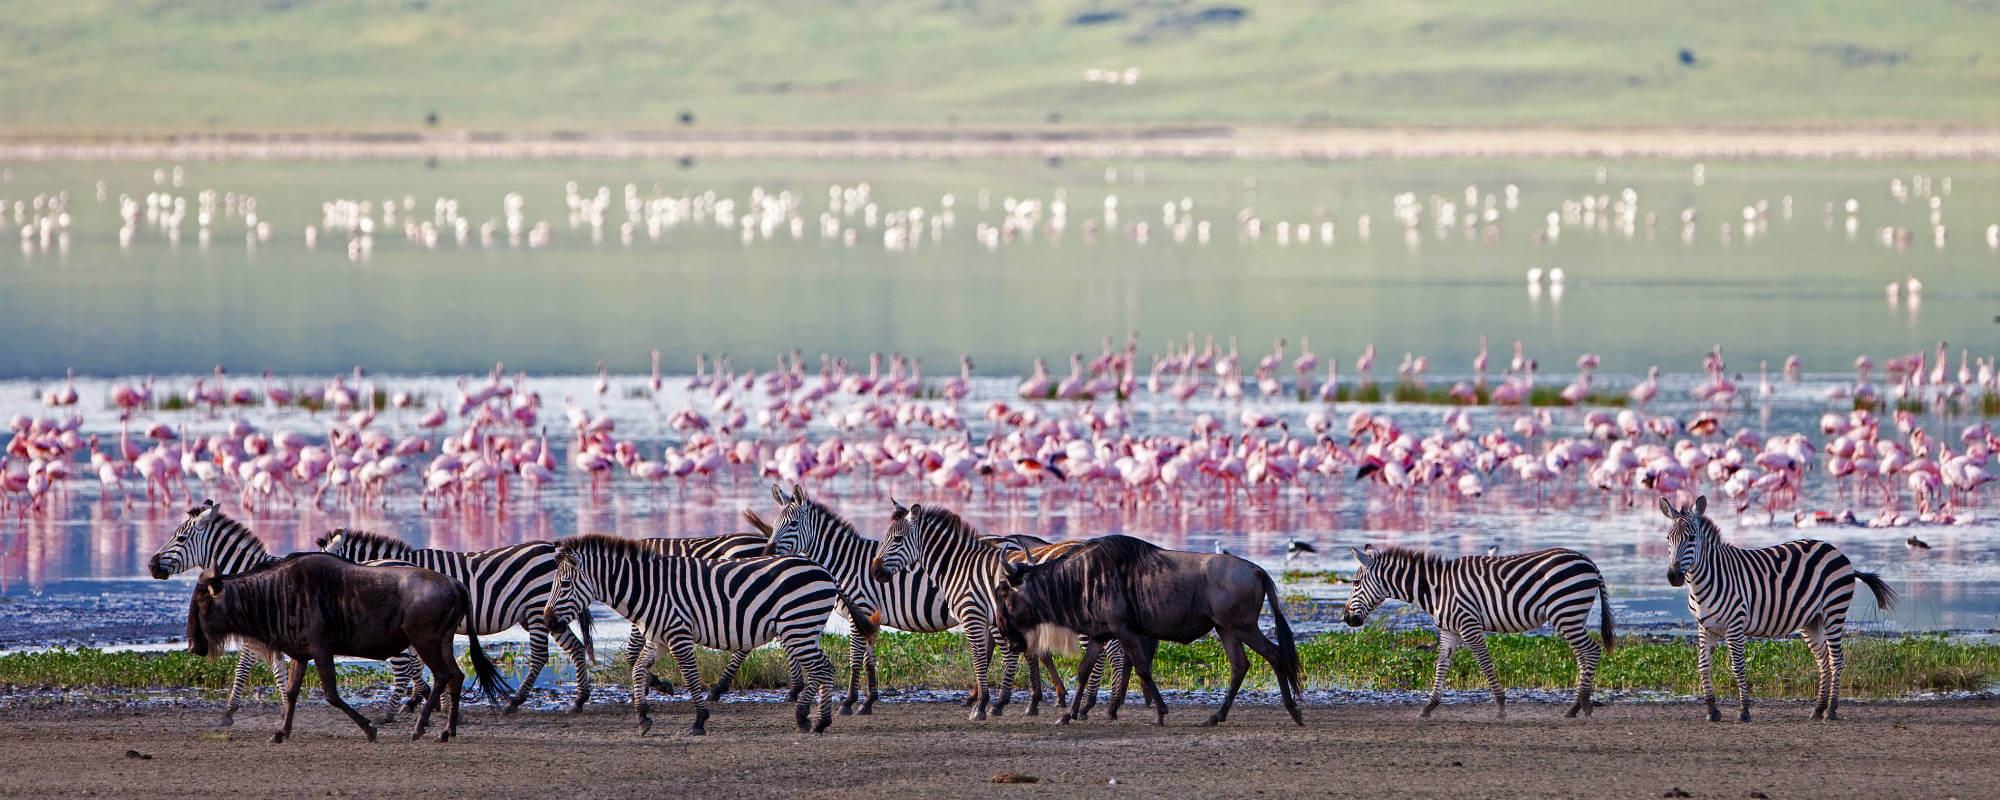 Zebra-tanzania